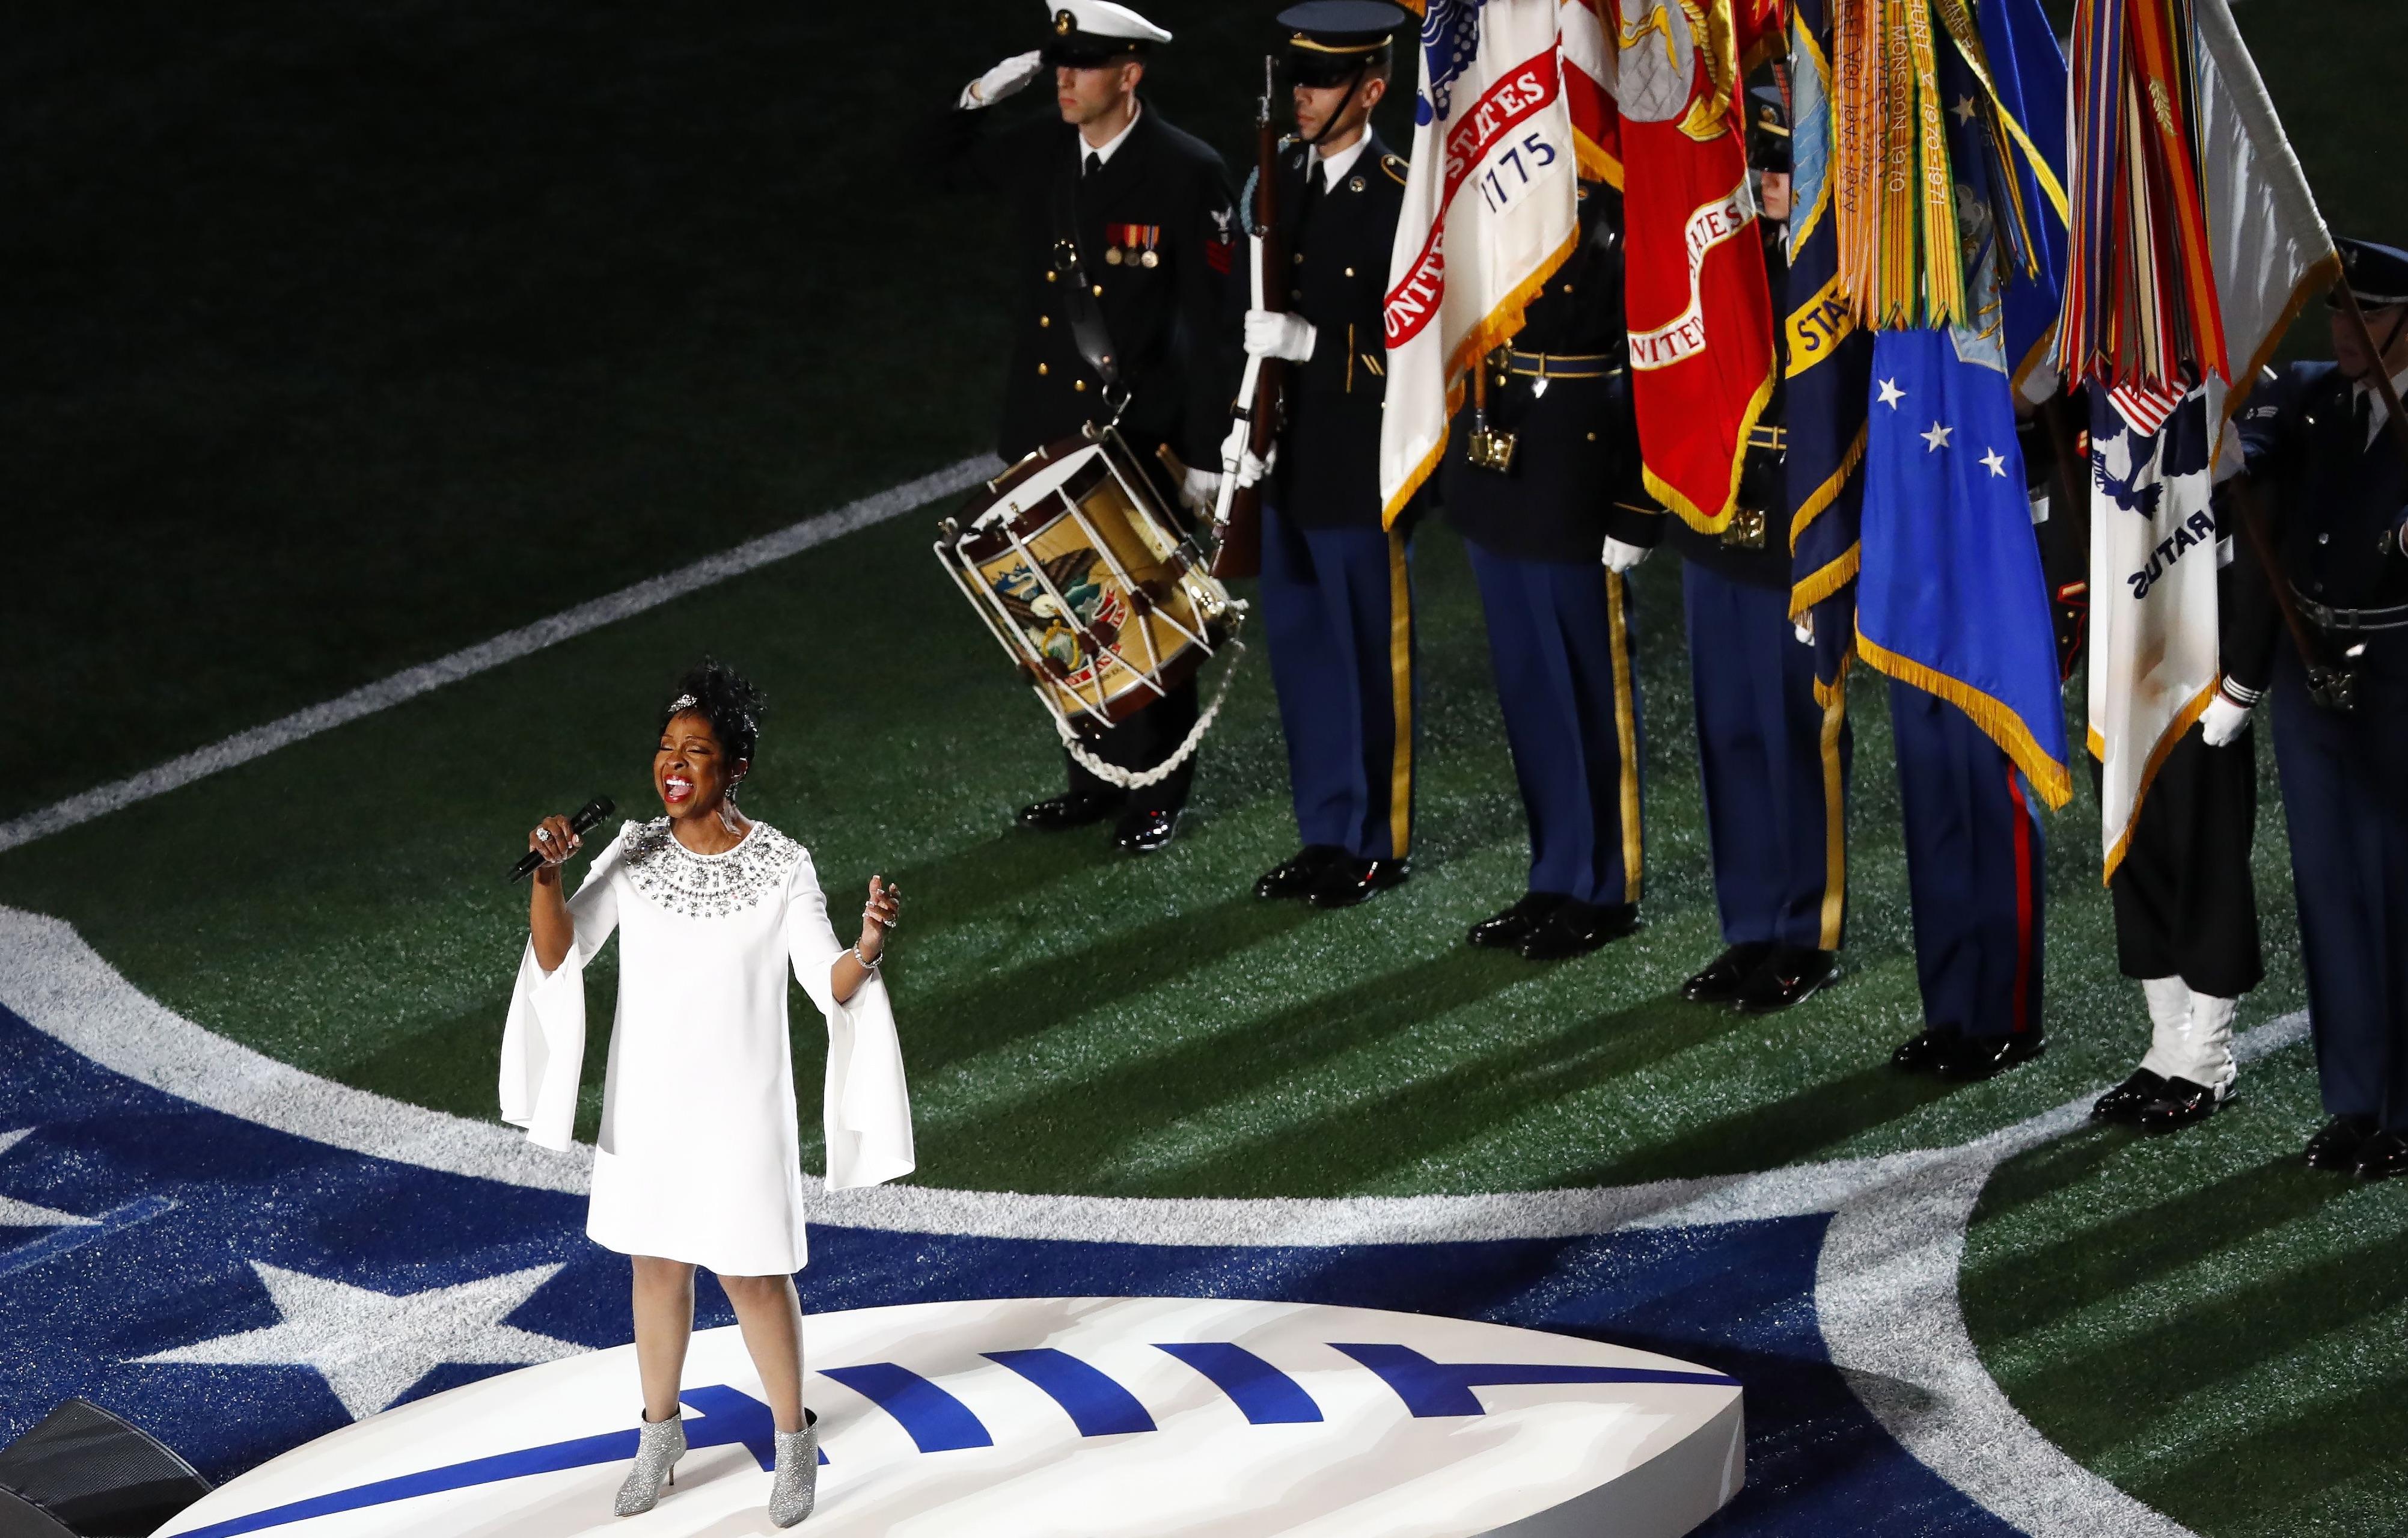 Super Bowl LIII: Watch Gladys Knight Belt Soulful Rendition of National Anthem